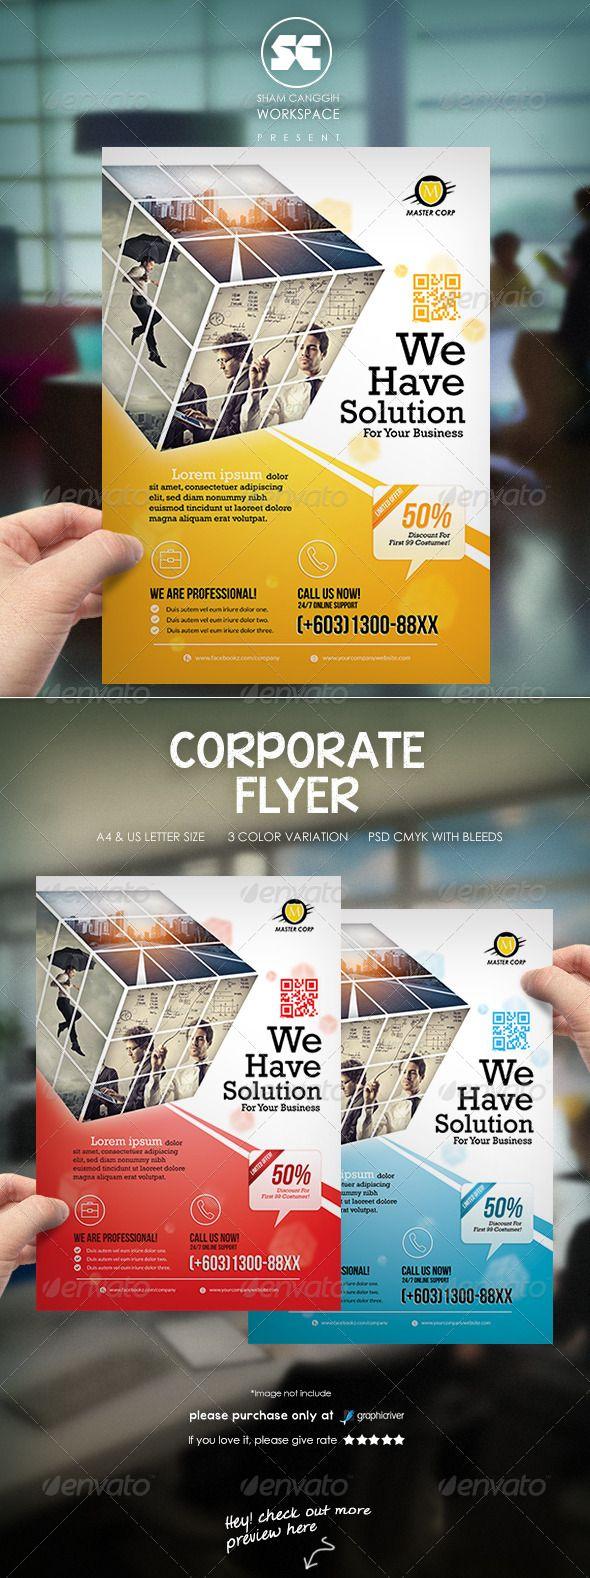 Clean Corporate Flyer Magazine Ads Desain Brosur Brosur Desain Grafis